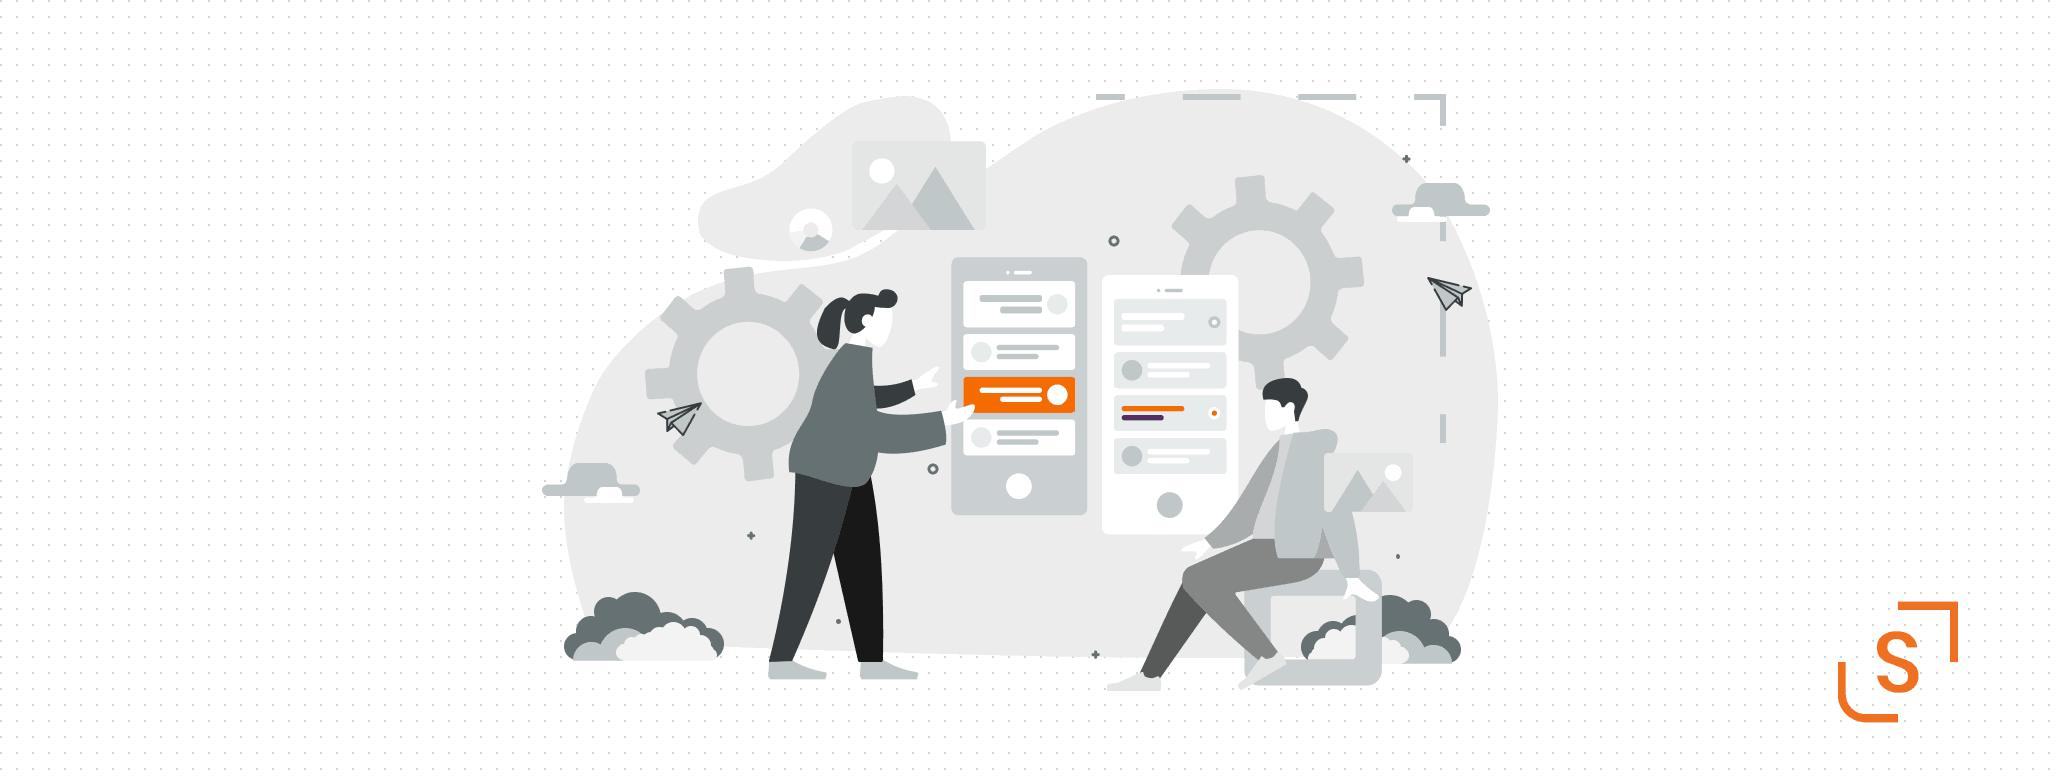 Designer-to-Designer Feedback: Tips in 2019